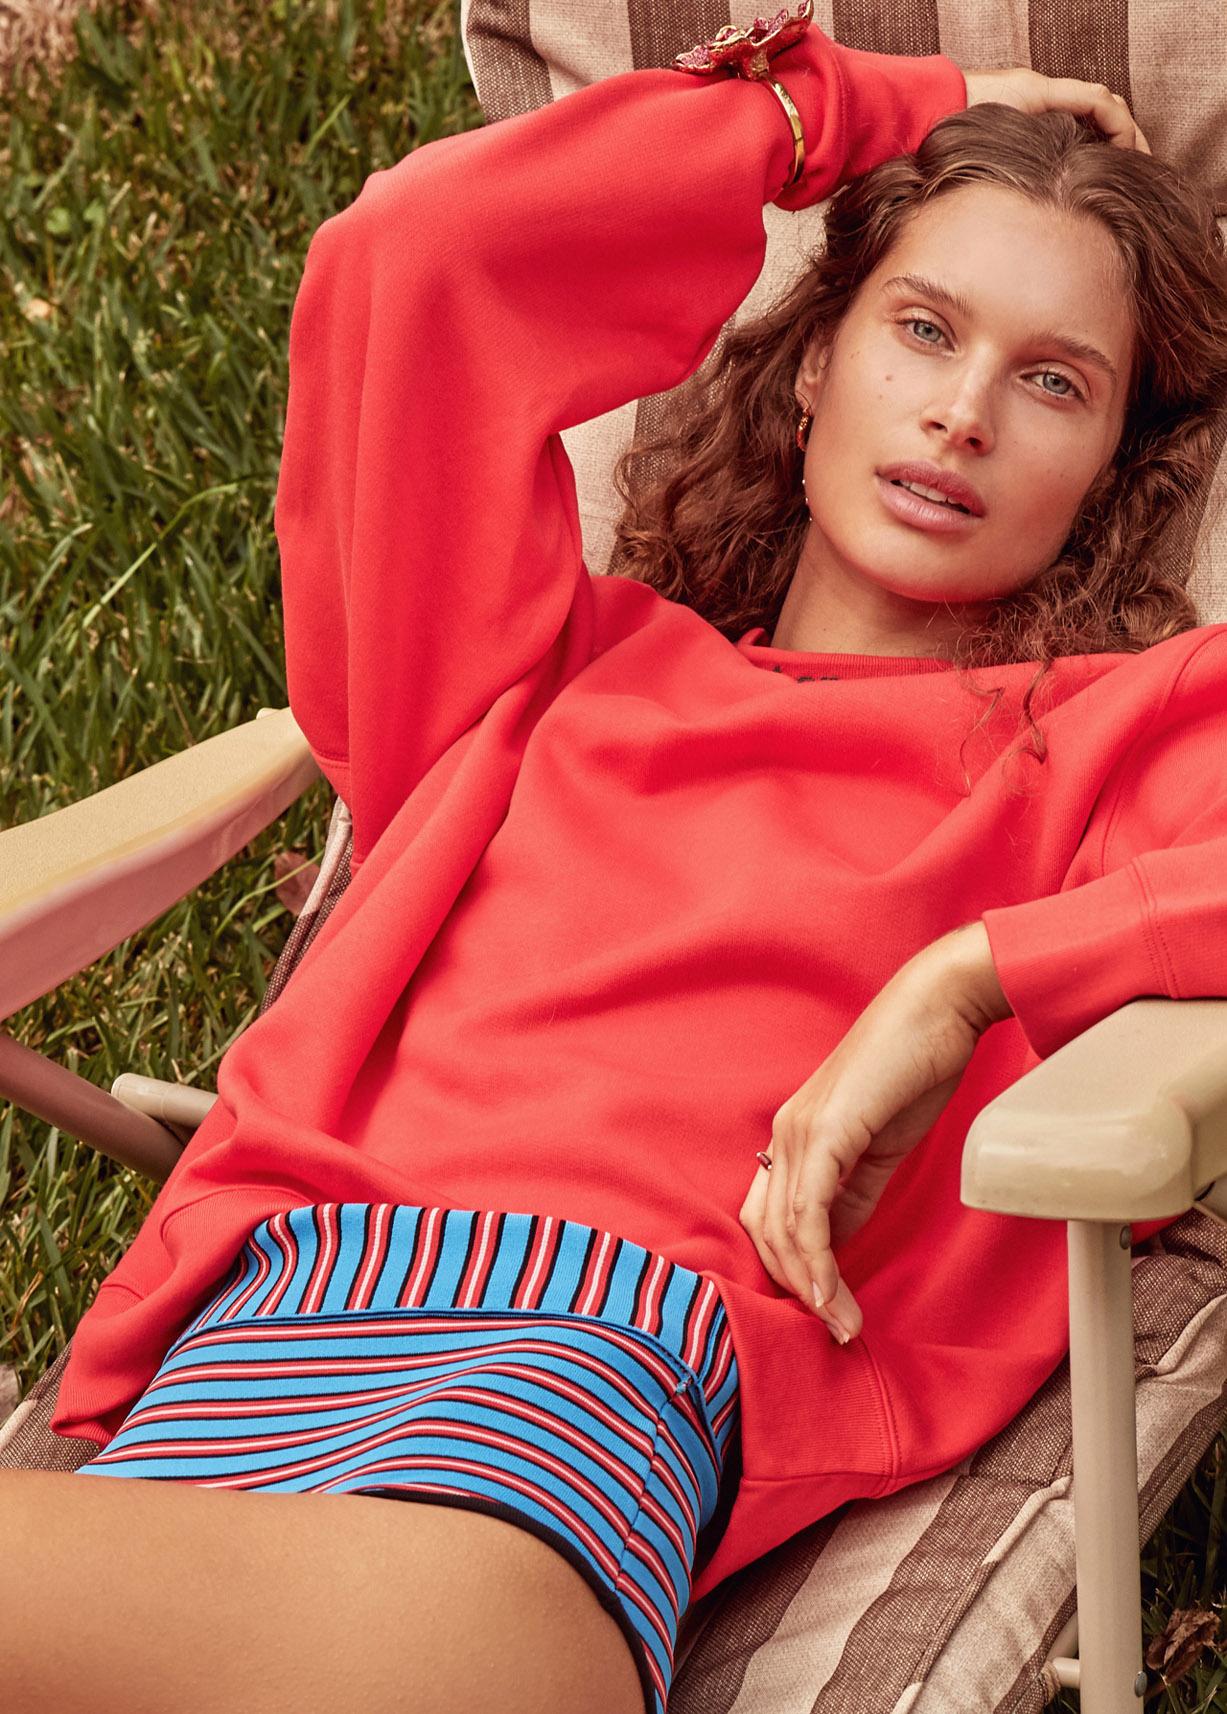 Lazy Sunday / Lise Olsen by Ryan Conduit / Grazia Australia may 2019